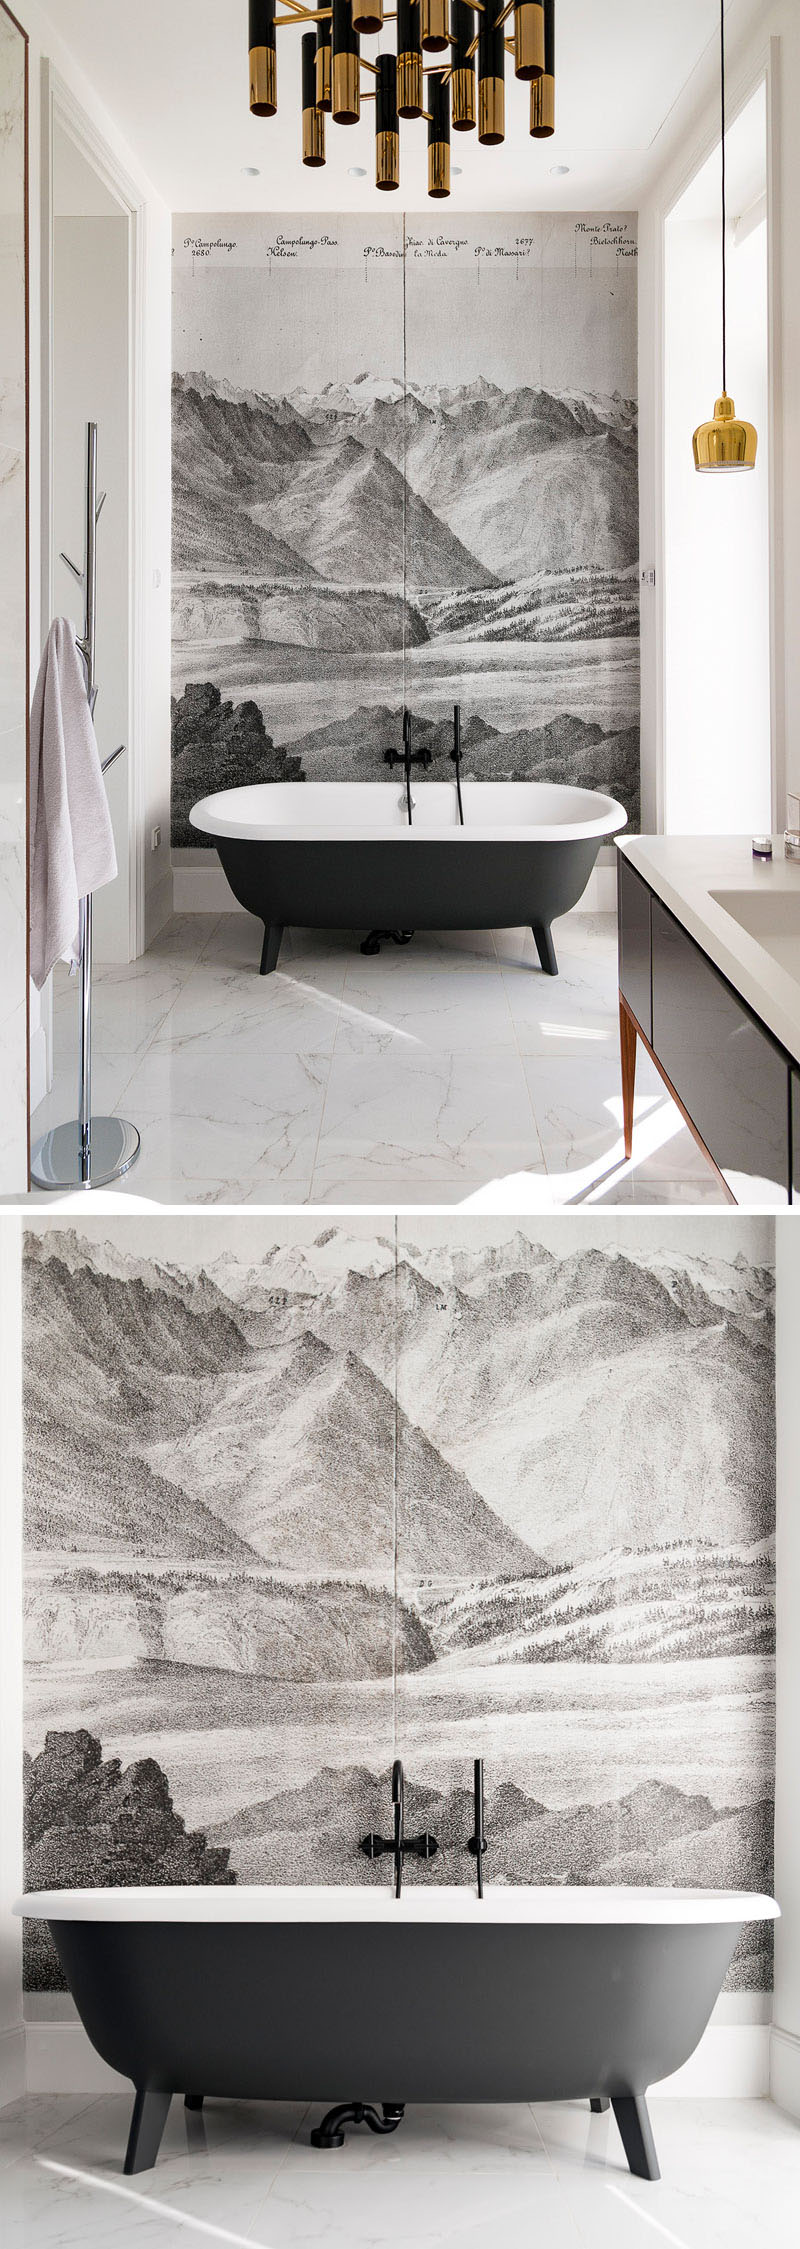 wall-mural-bathroom-141216-413-09 | CONTEMPORIST